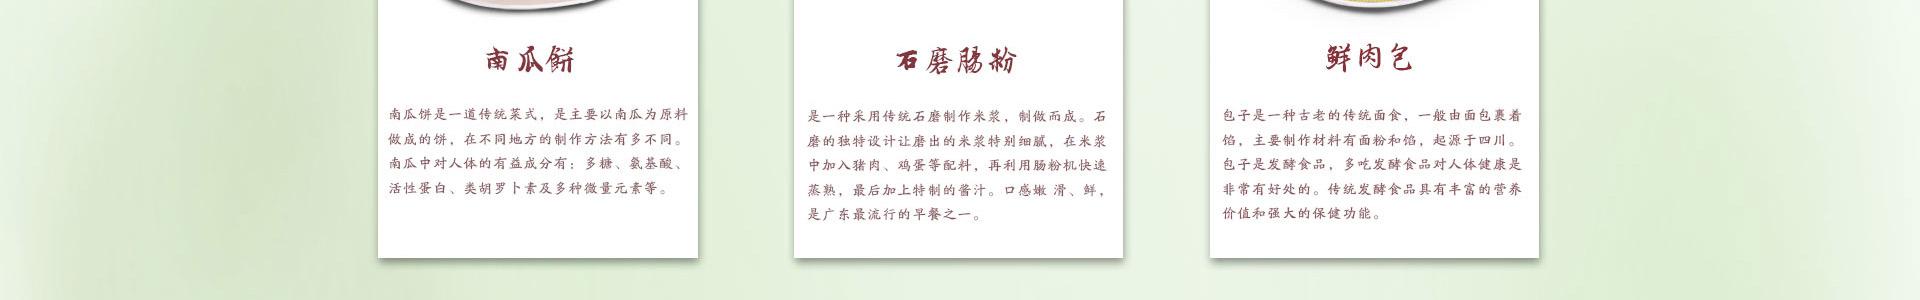 老祖宗石磨坊laozuzong_05